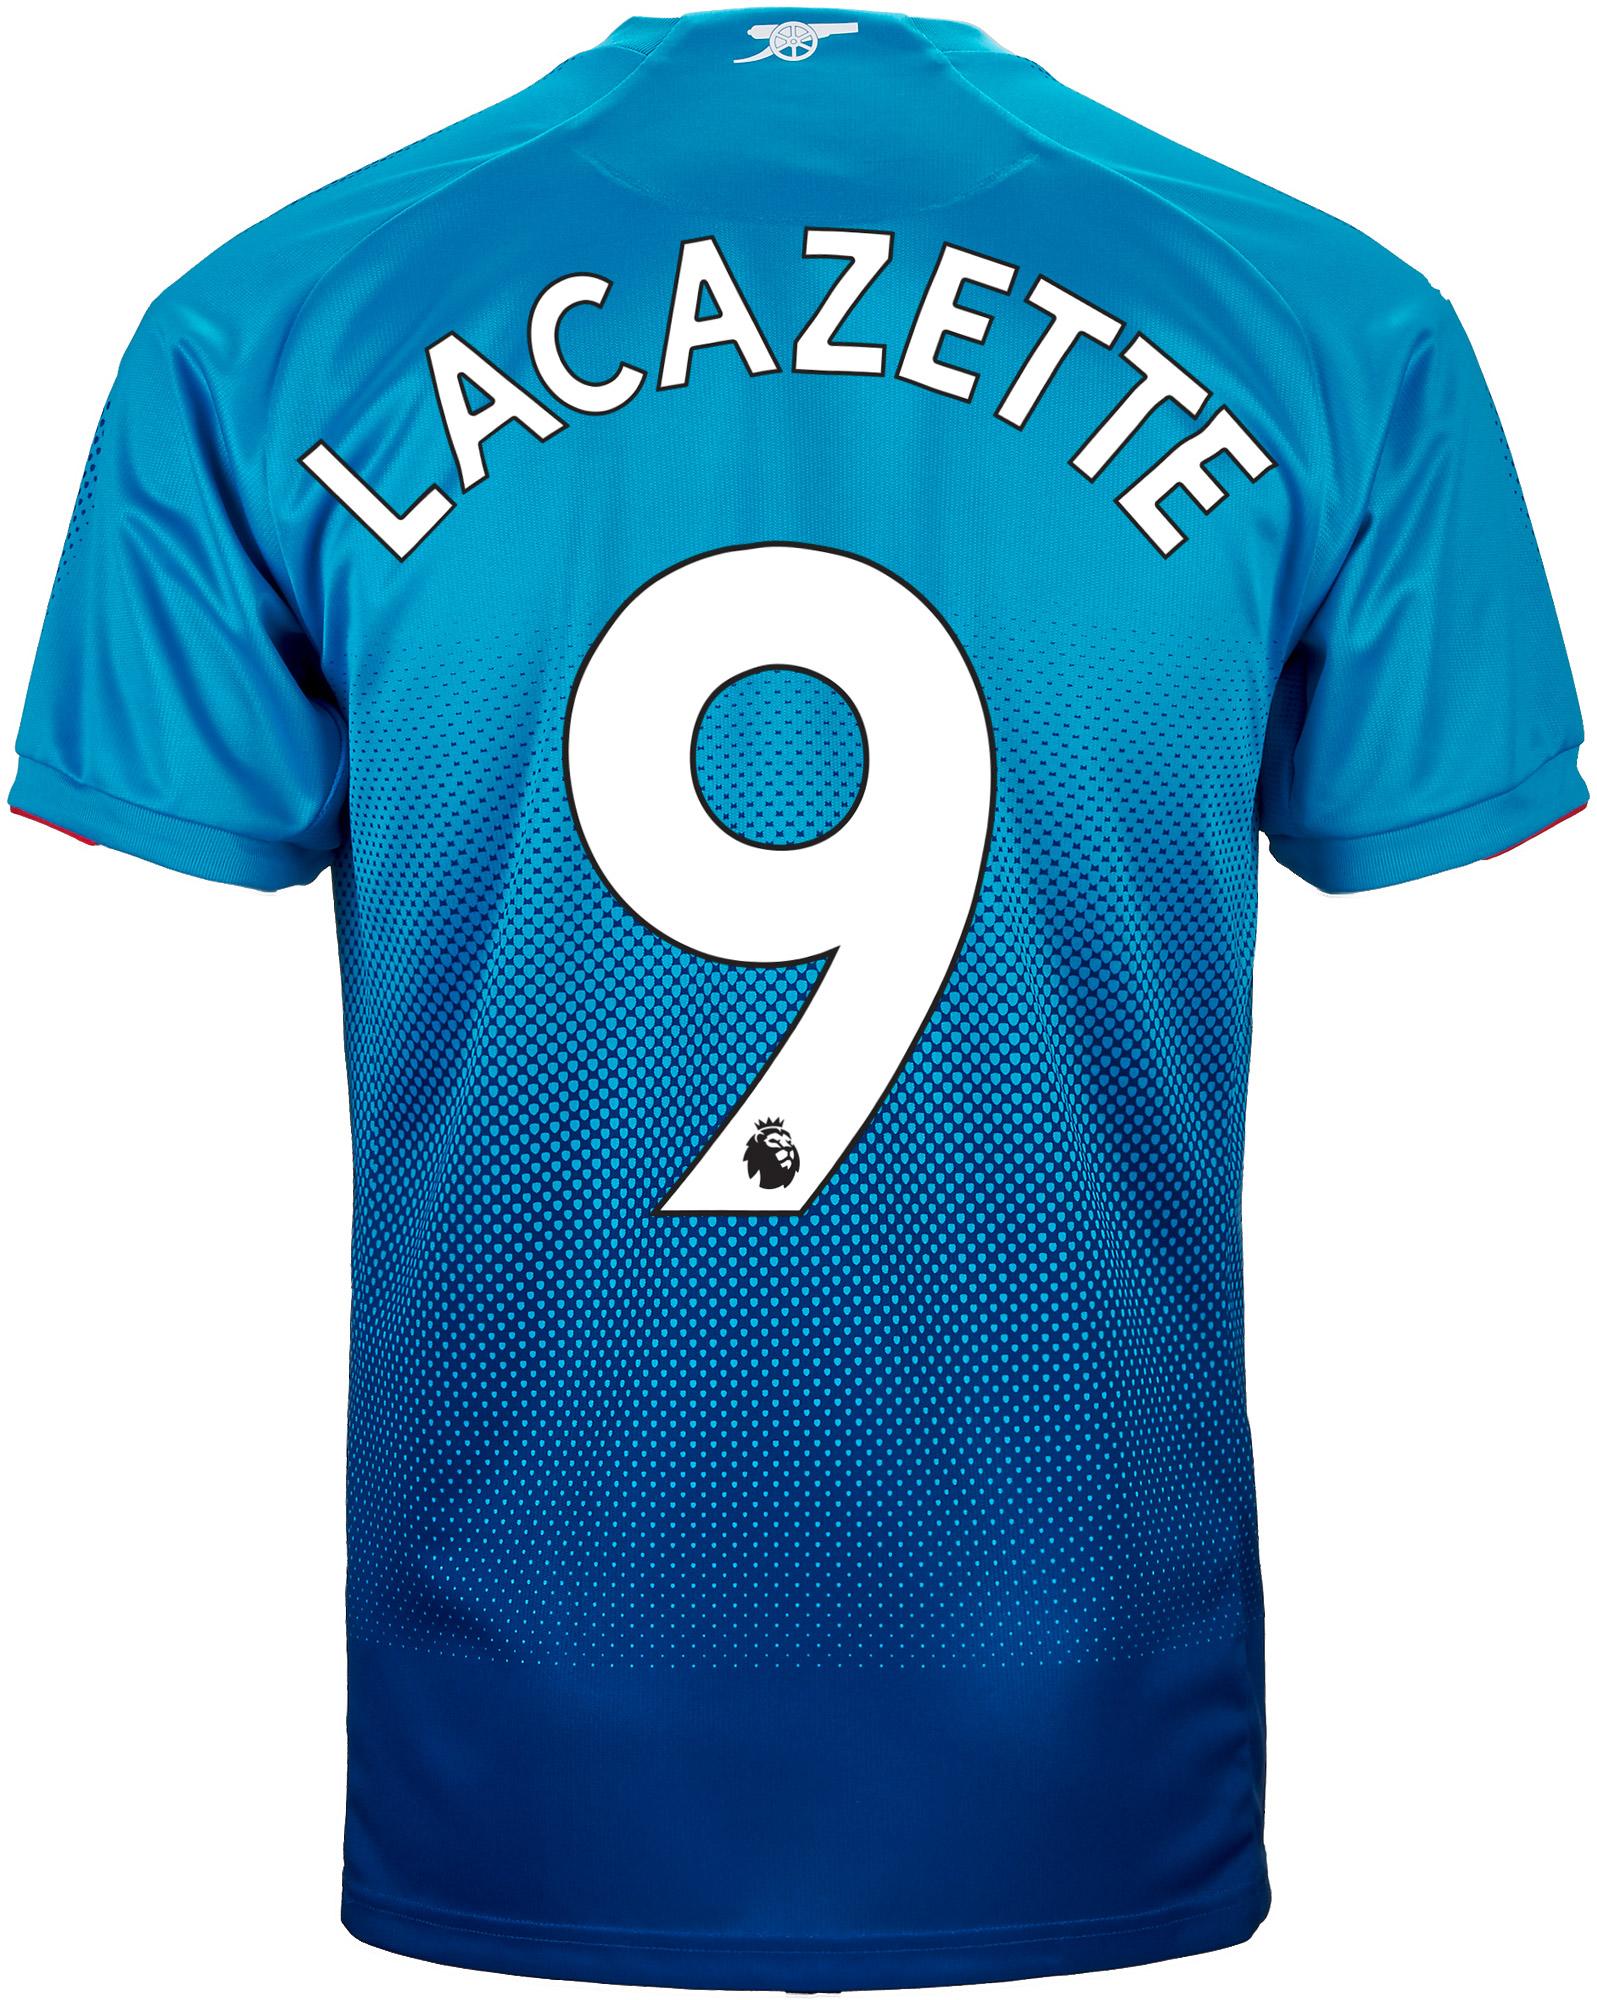 Alexandre Lacazette Arsenal Away Jersey